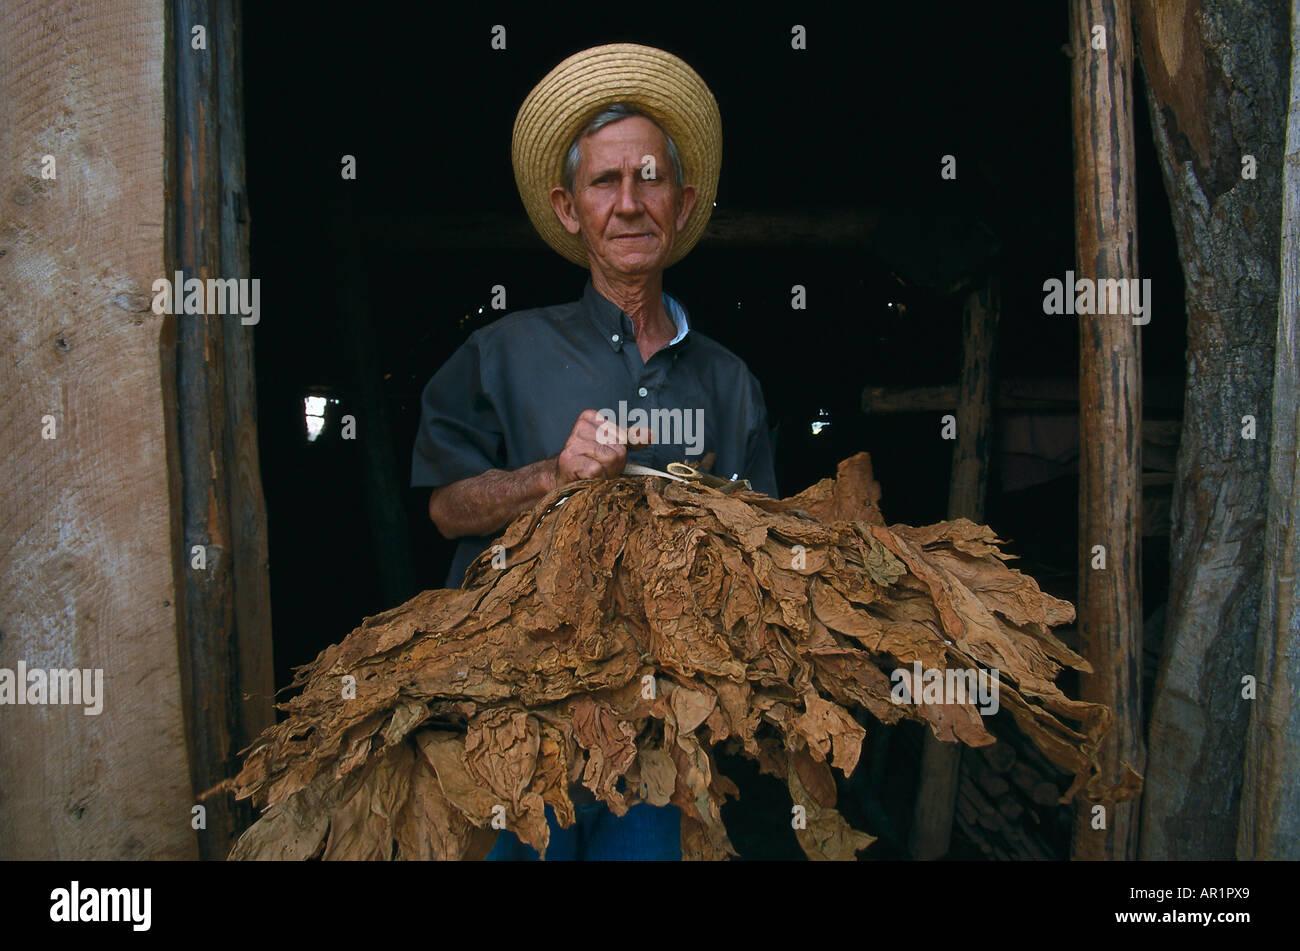 tobacco farmer in doorway with dried leaves, Valle de Vinales, Cuba - Stock Image